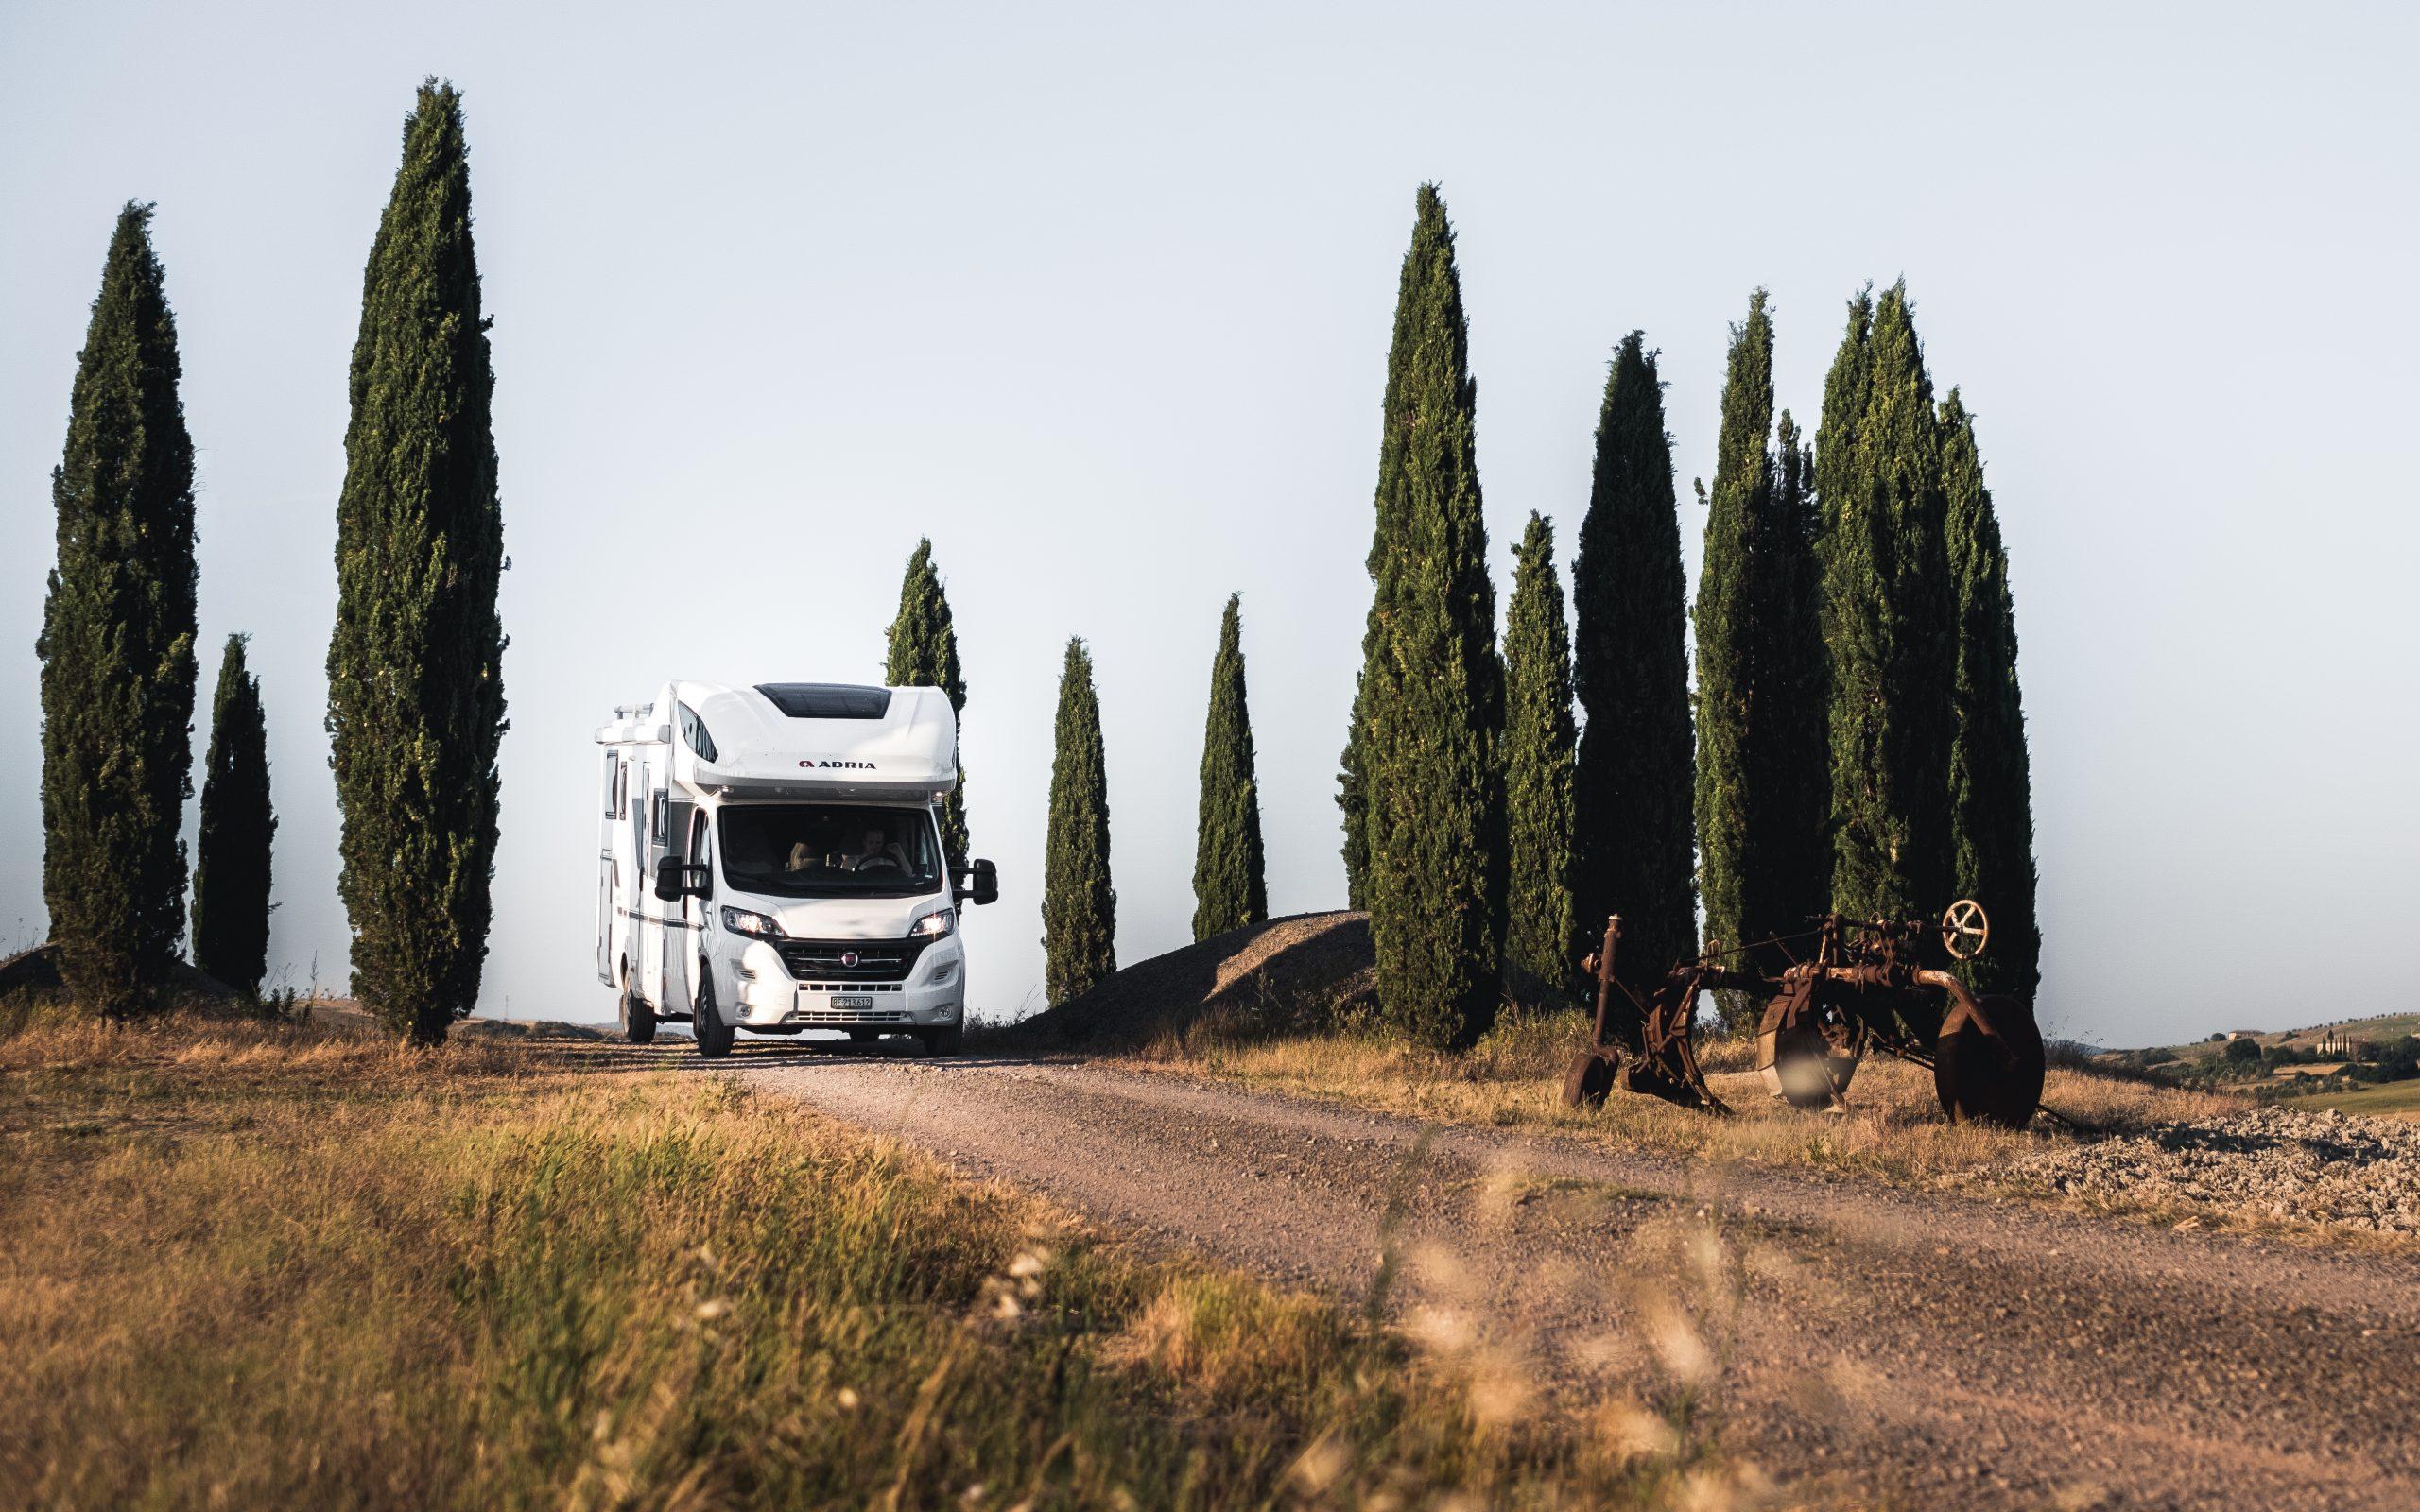 Roadtrip Toskana – 7 Tage mit dem Wohnmobil unterwegs